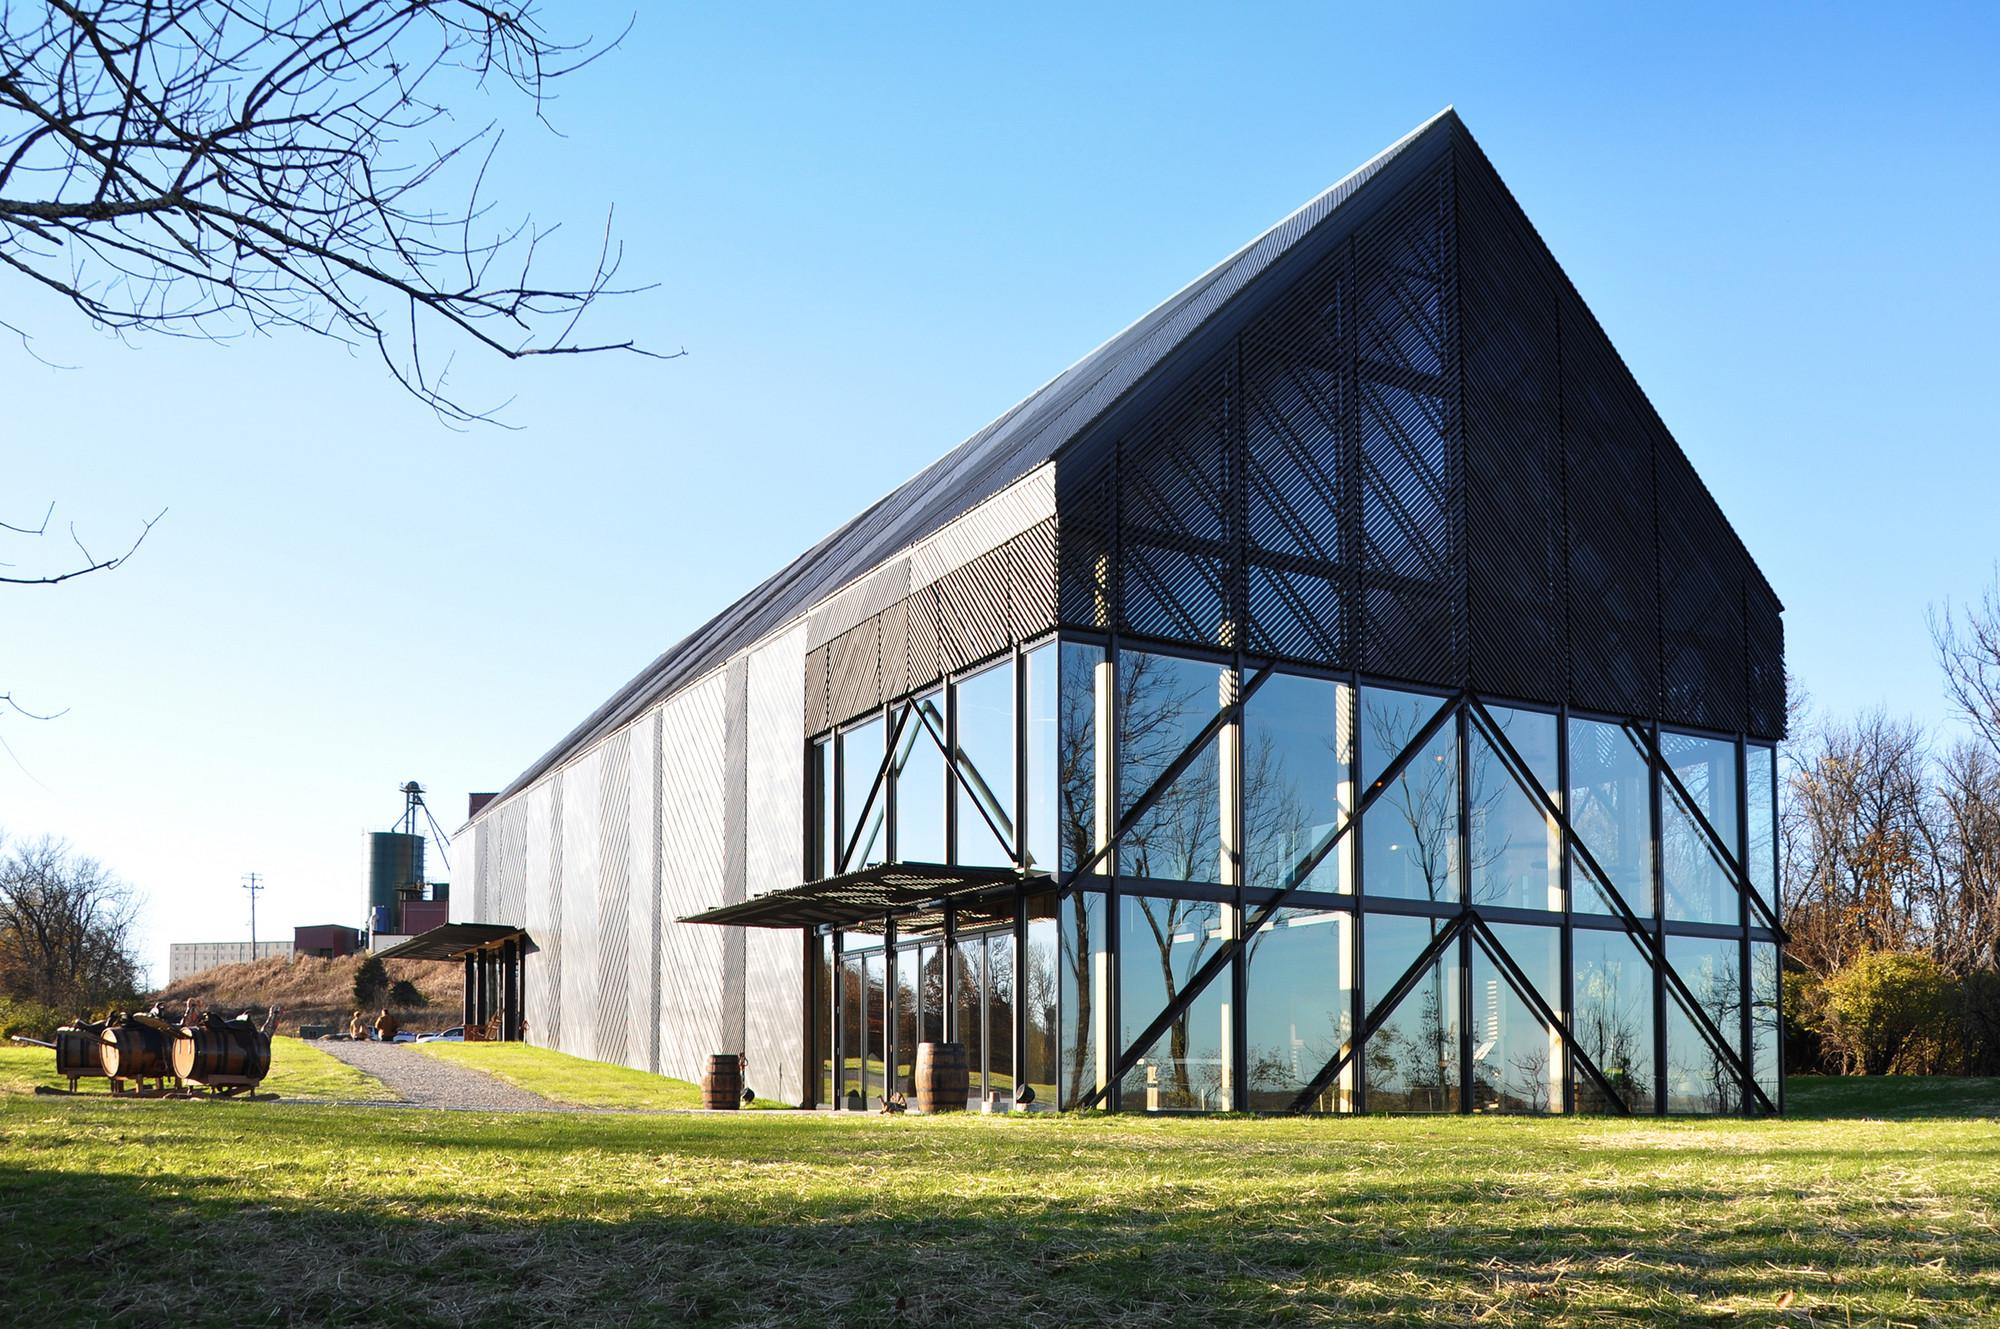 Wild Turkey Bourbon Visitor Center / De Leon & Primmer Architecture Workshop. Image Courtesy of De Leon & Primmer Architecture Workshop